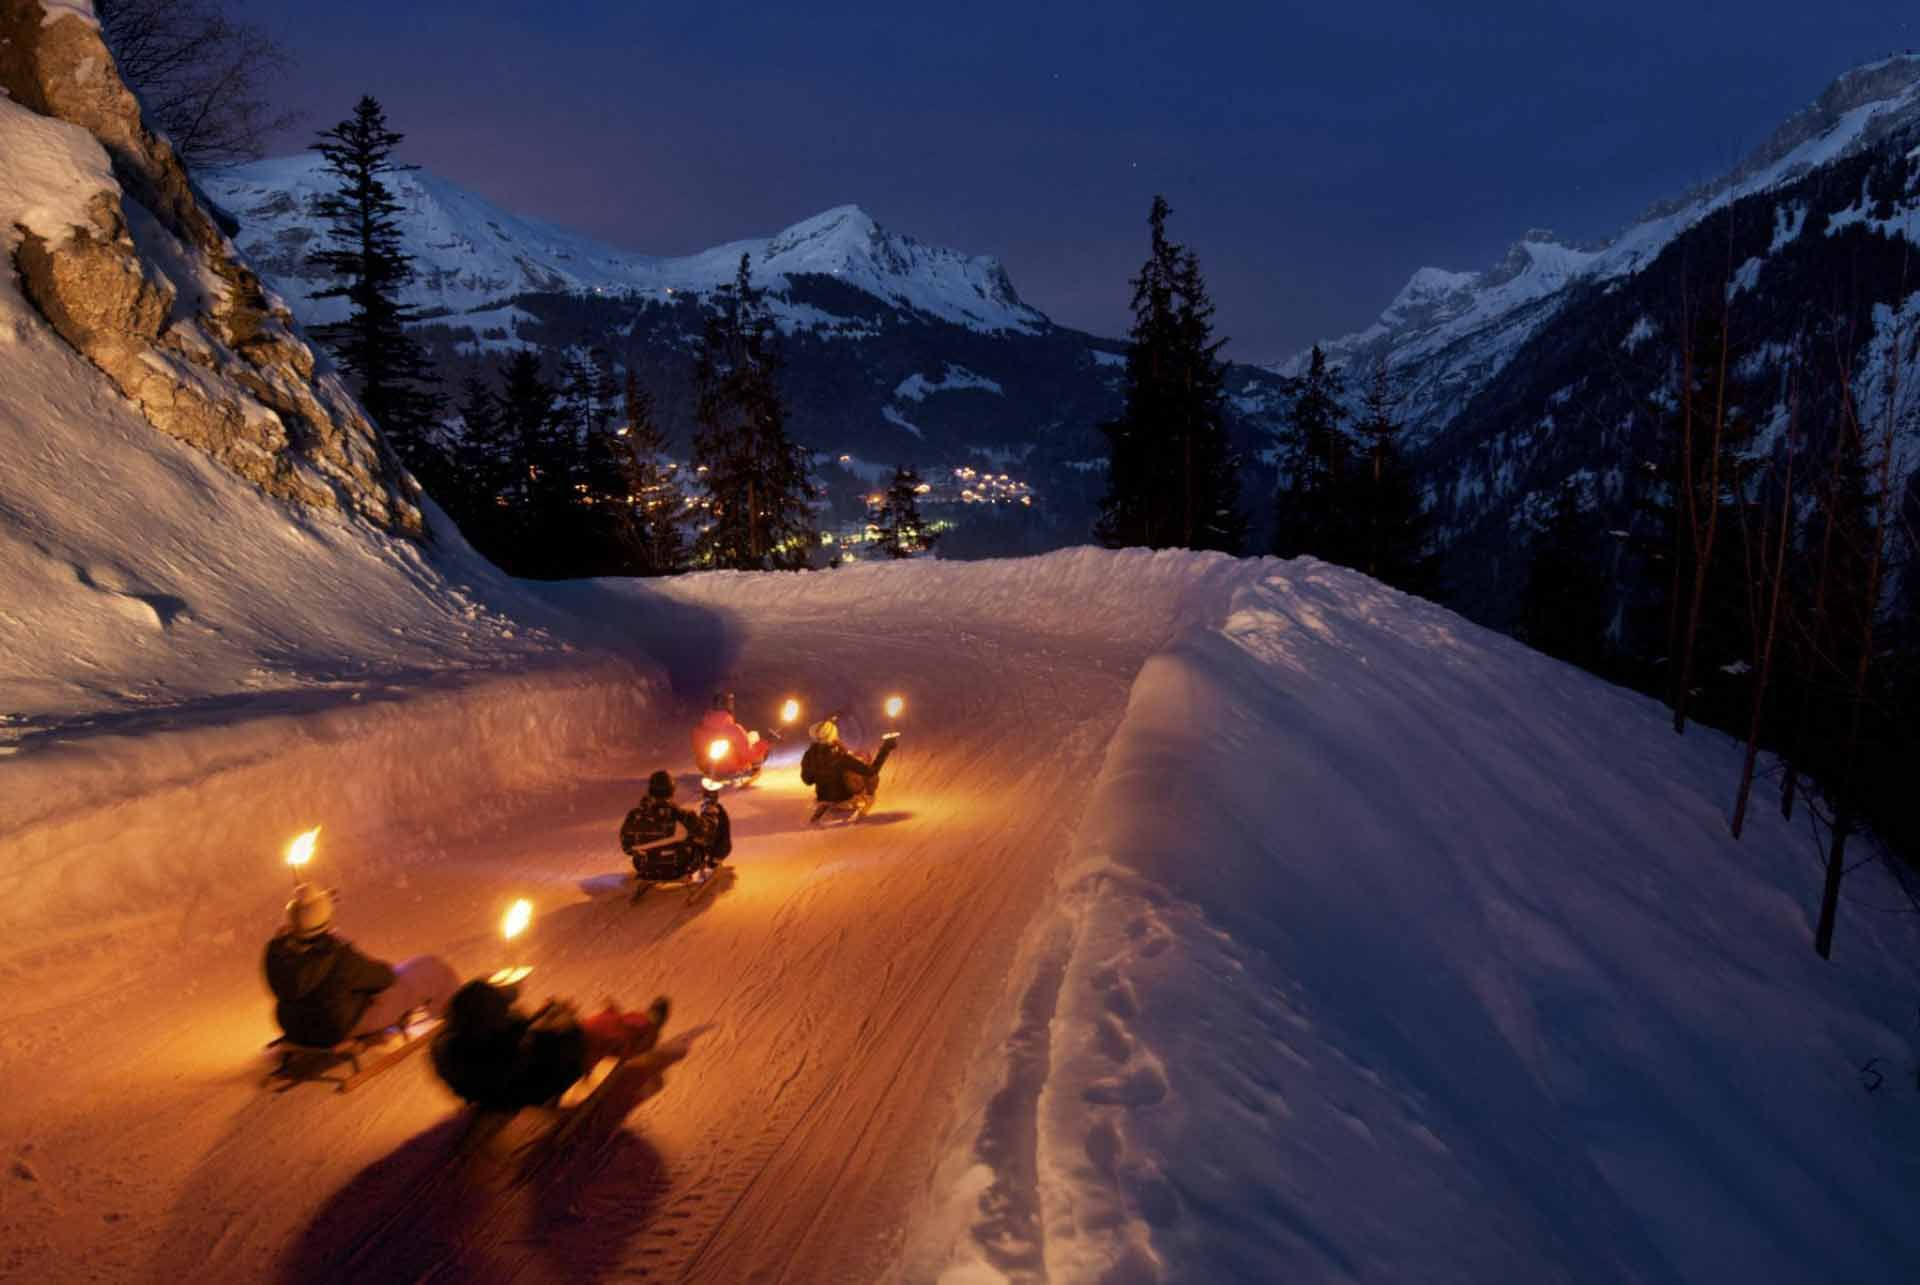 Night Sledding (Winter)